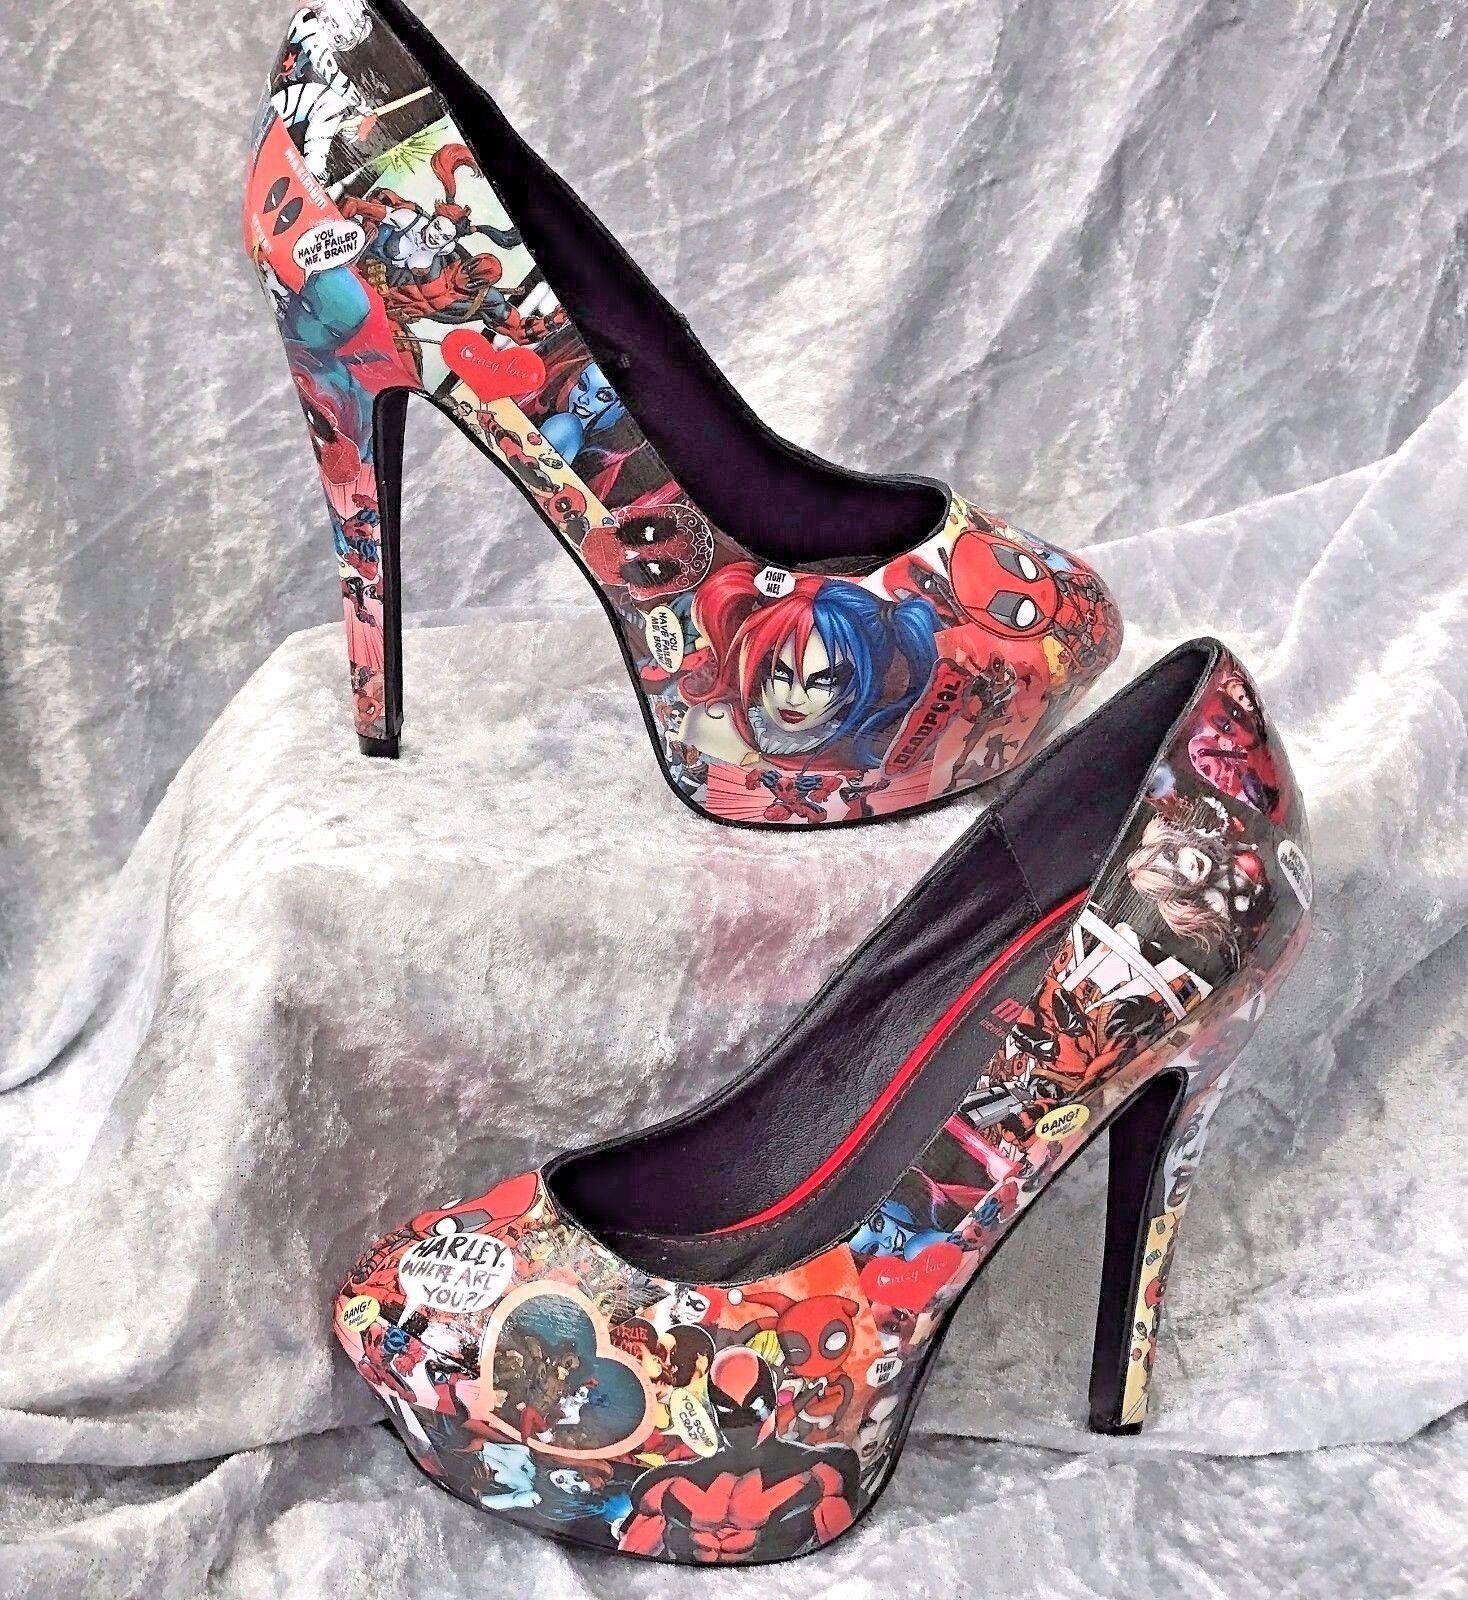 Harley Quinn & & & Deadpool personnalisé DECOUPIS Chaussures. Geek cosplay. Tailles UK 3-8 0ff522